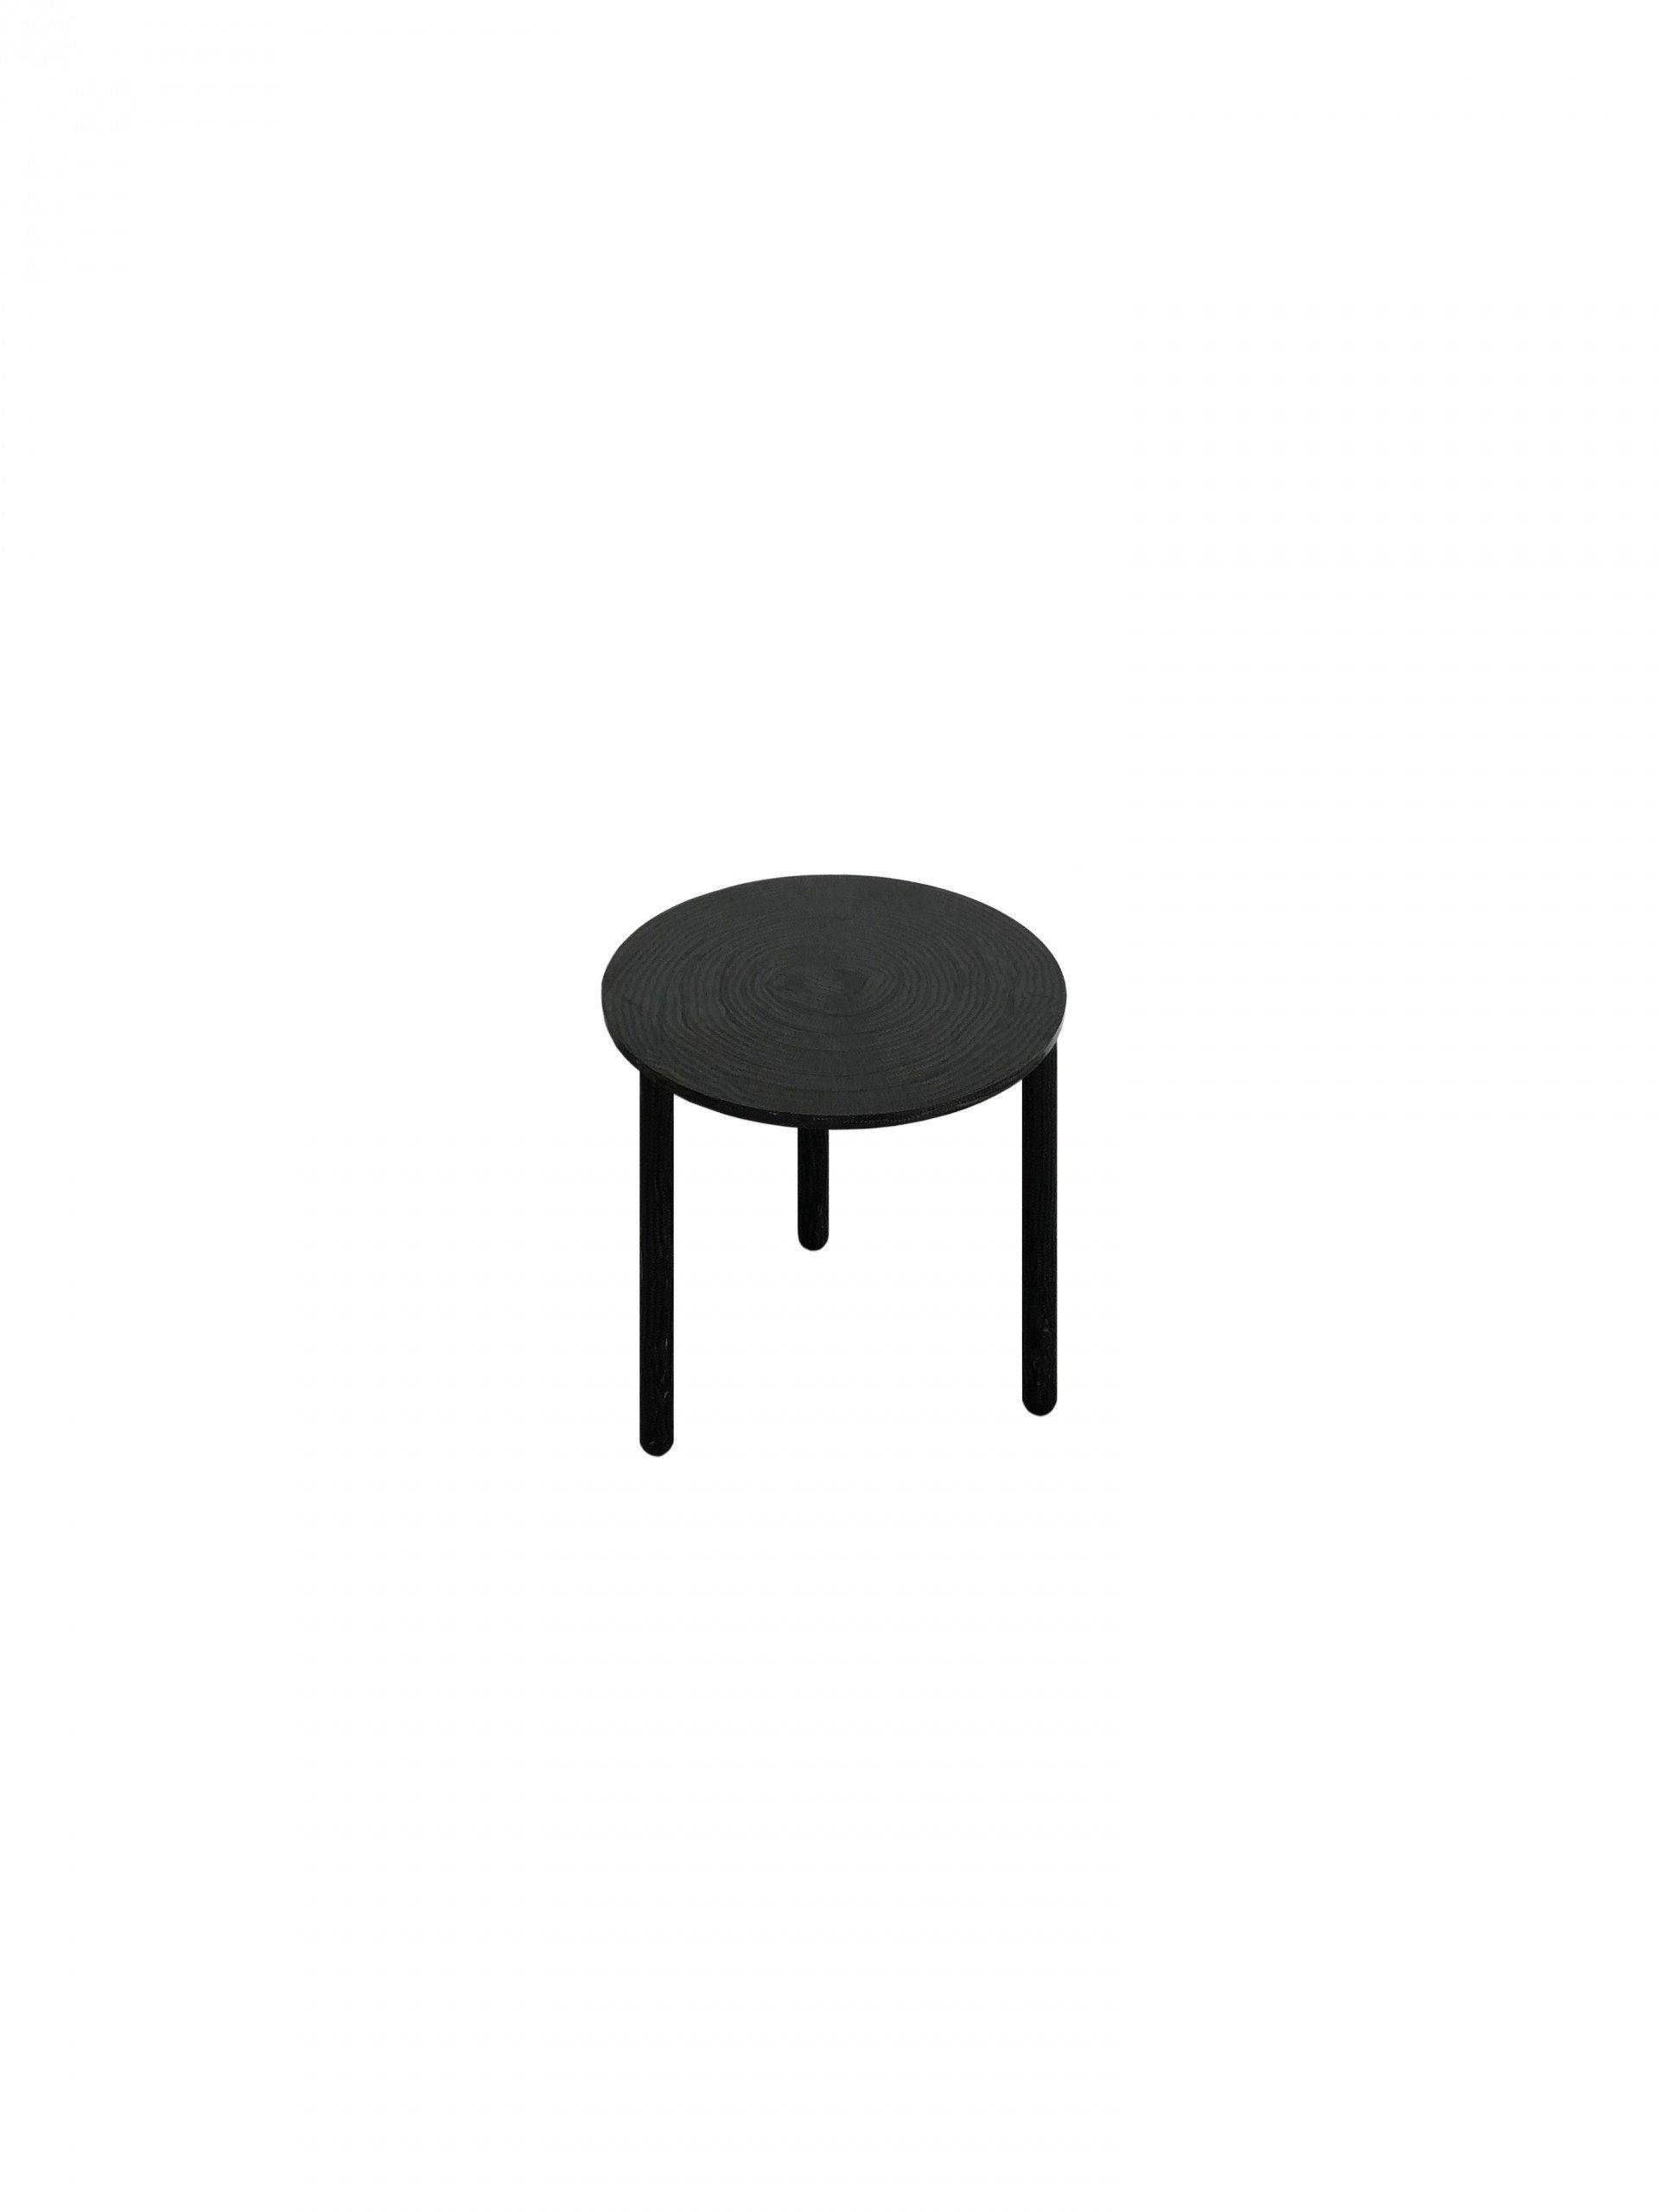 Tile Blush Jonathan Muecke – Open Objects